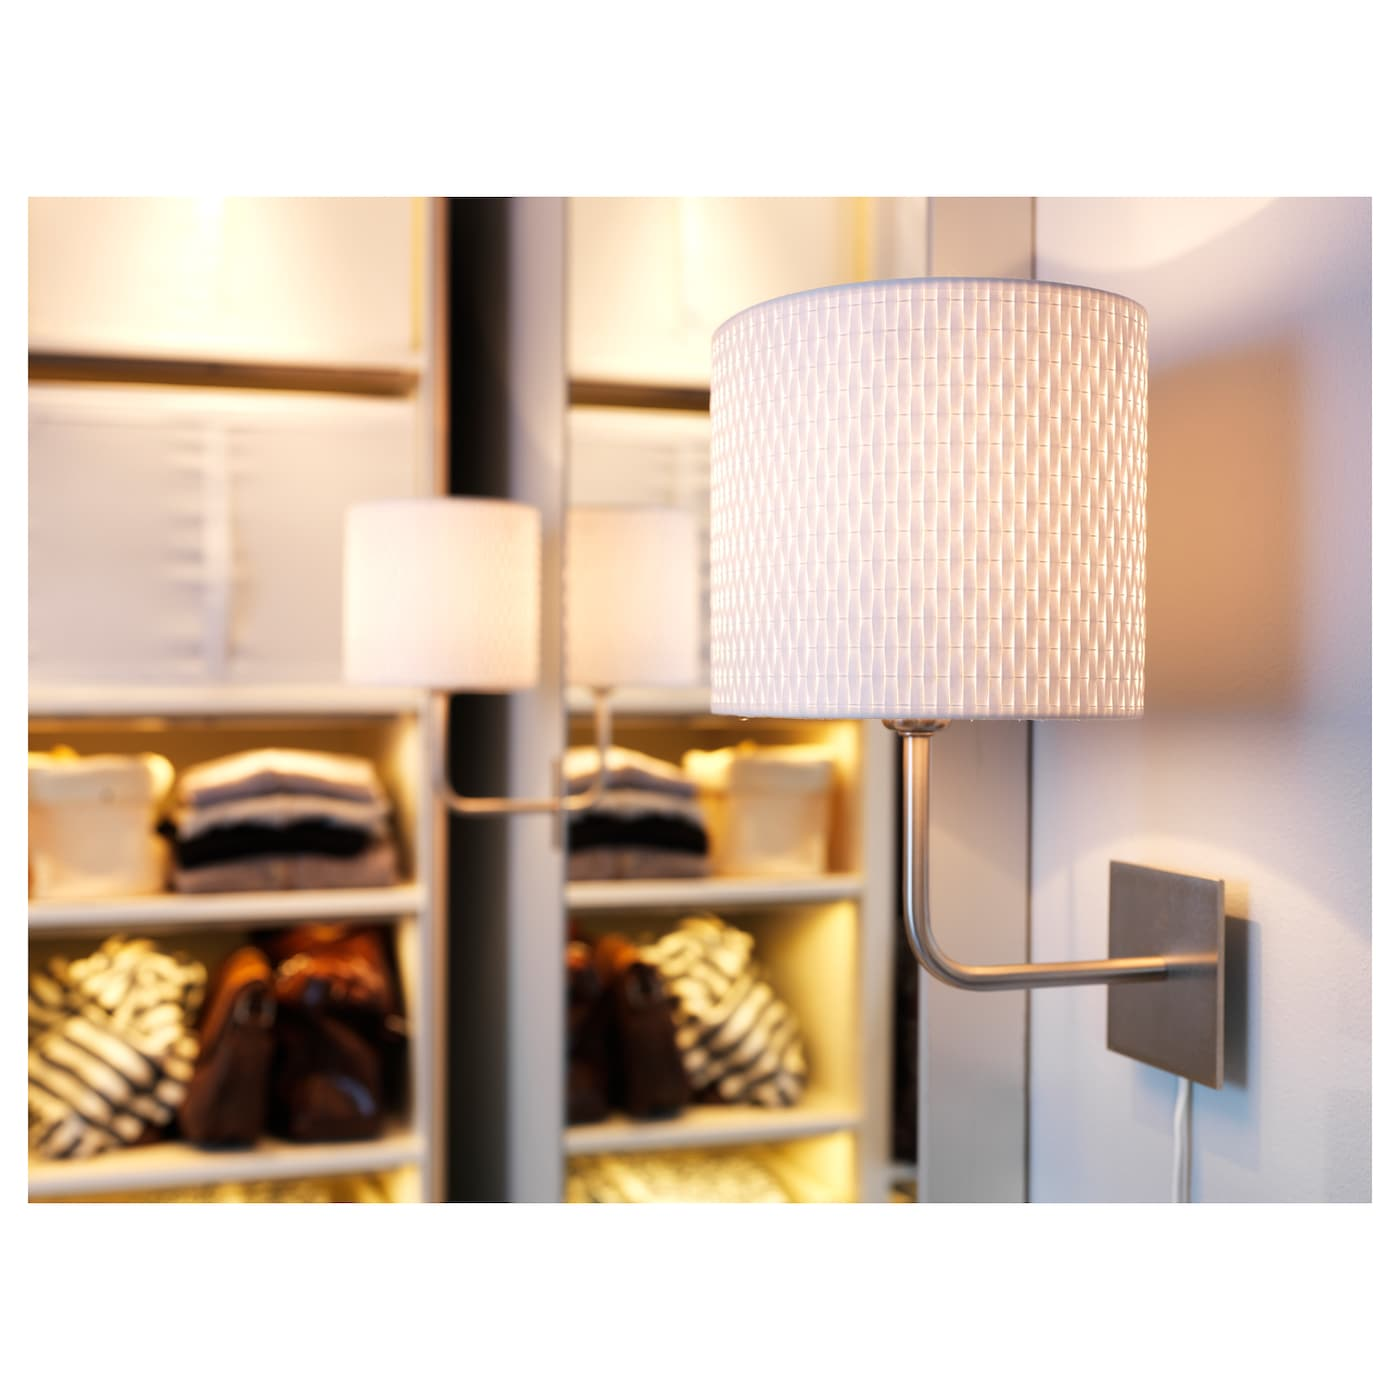 Alng wall lamp nickel platedwhite ikea ikea alng wall lamp gives a soft mood light aloadofball Gallery